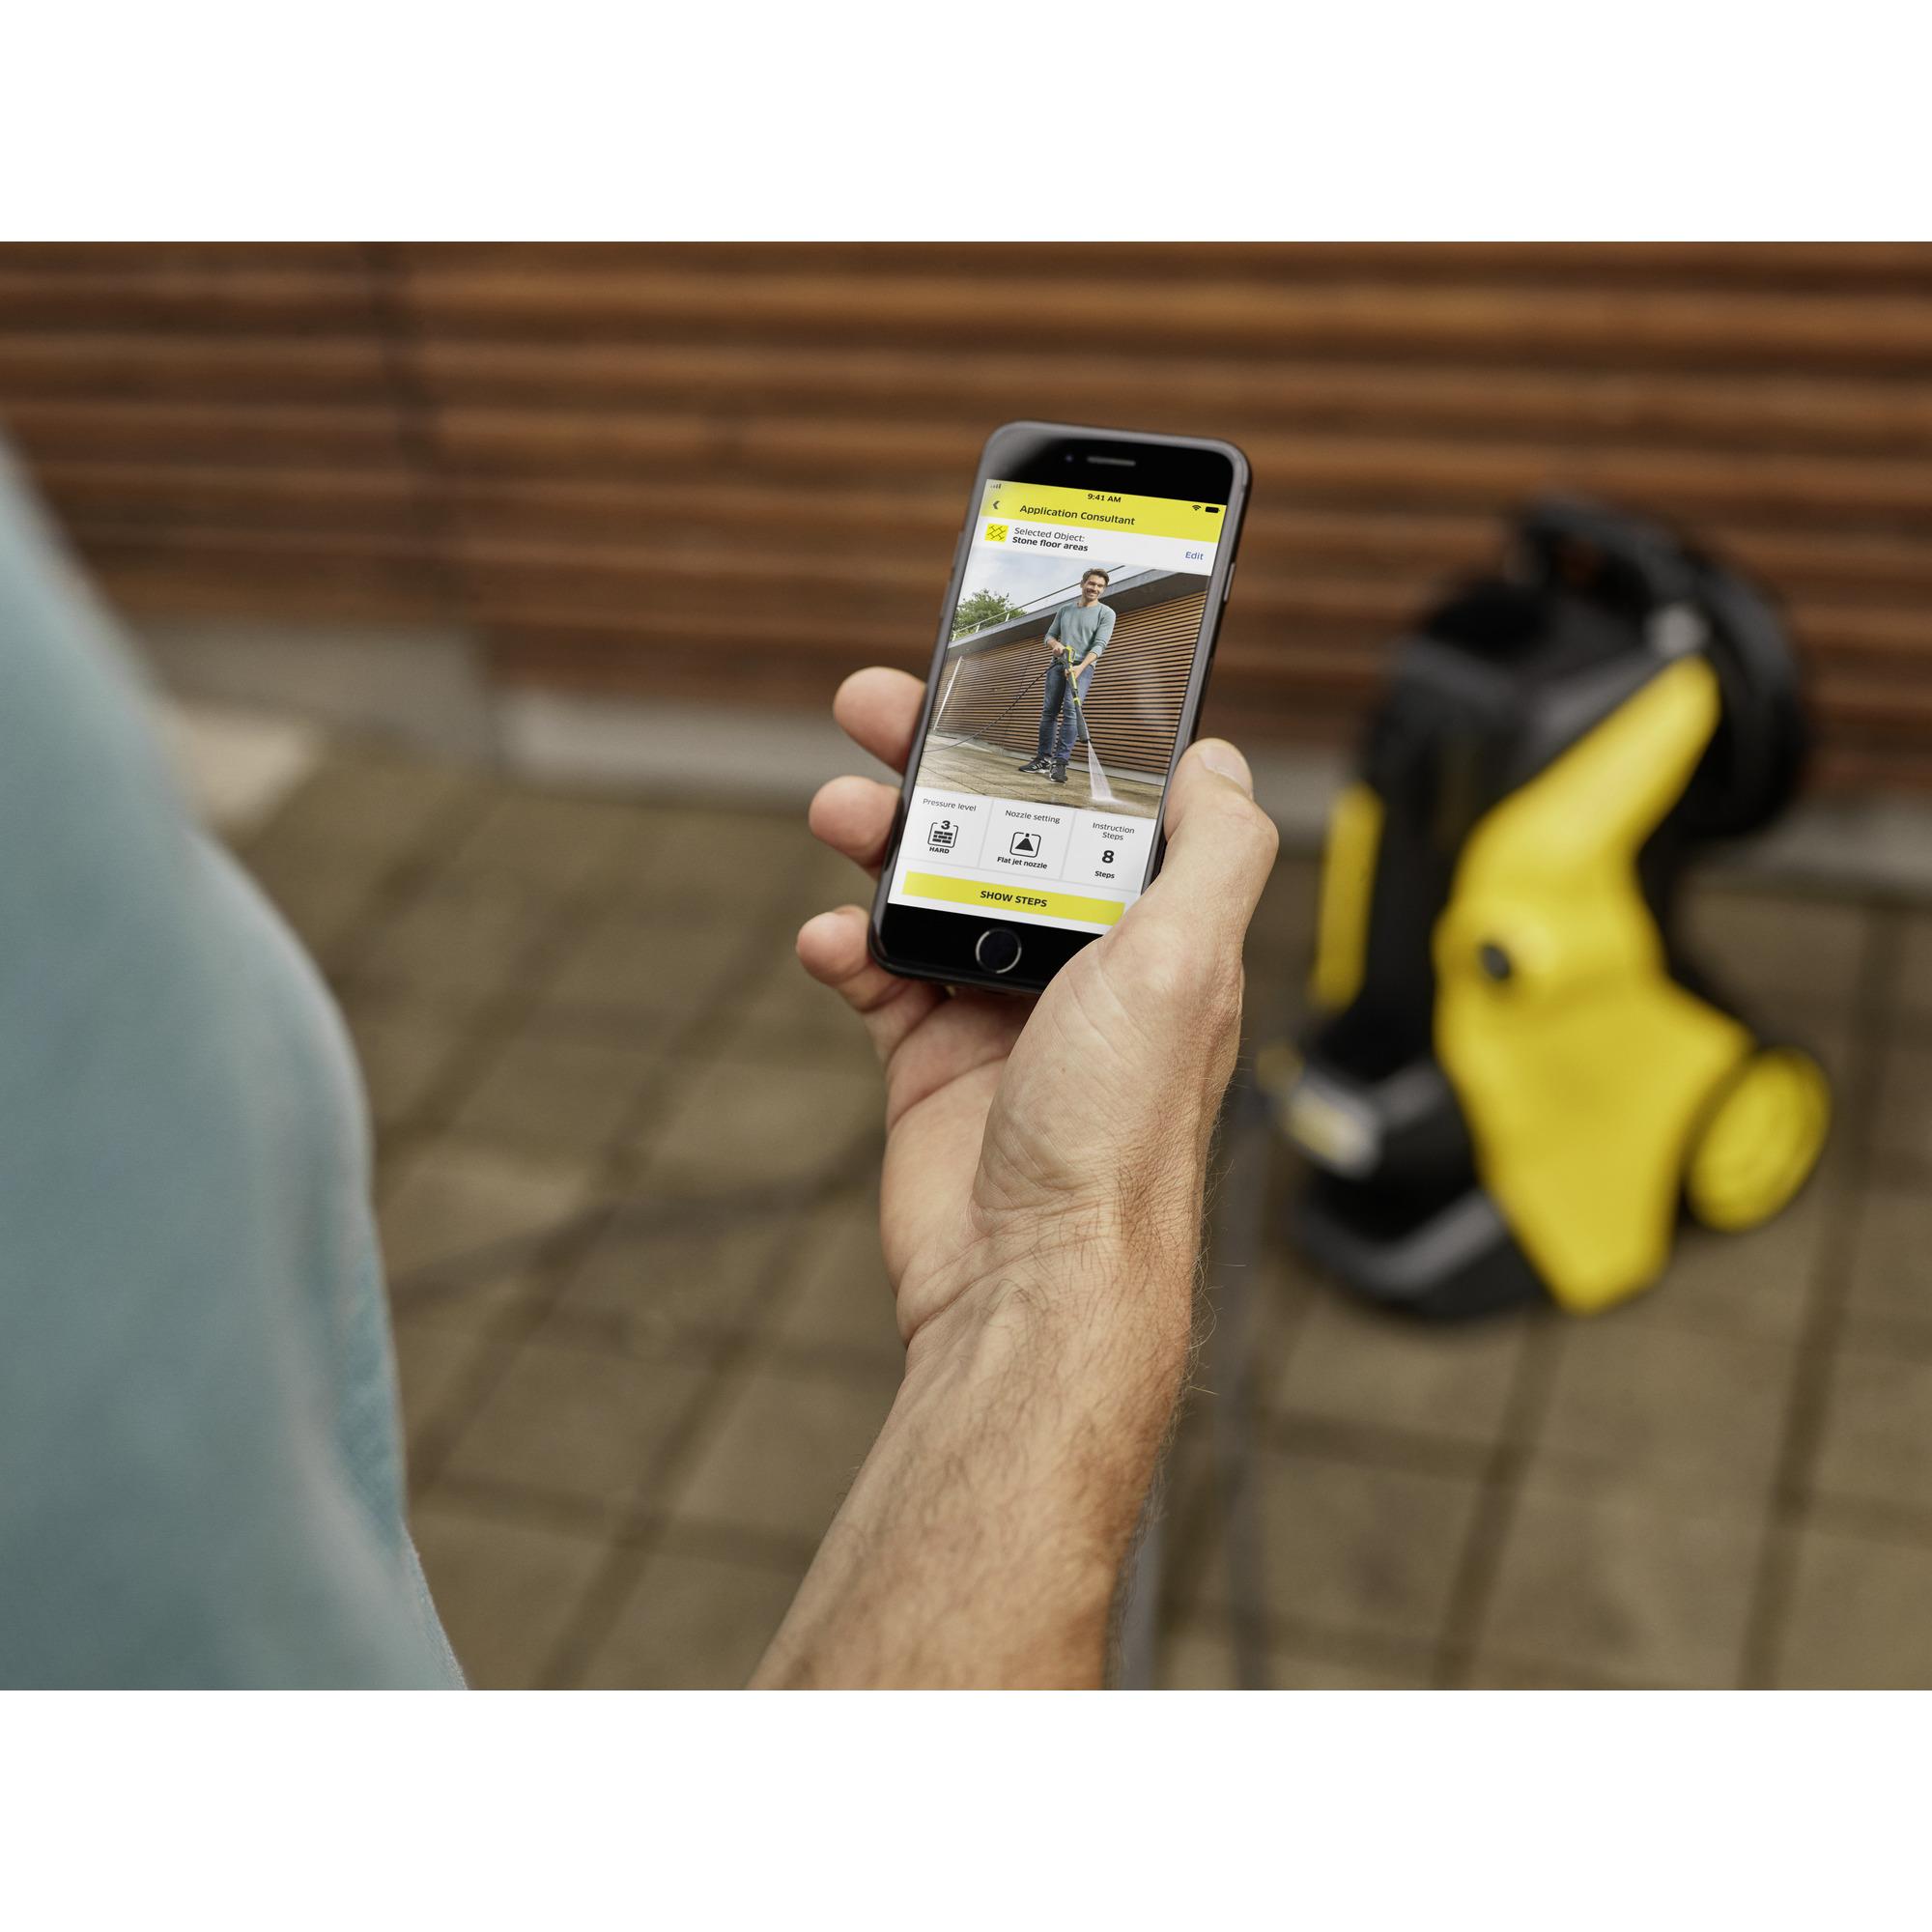 Kärcher K 5 Premium Smart Control Home